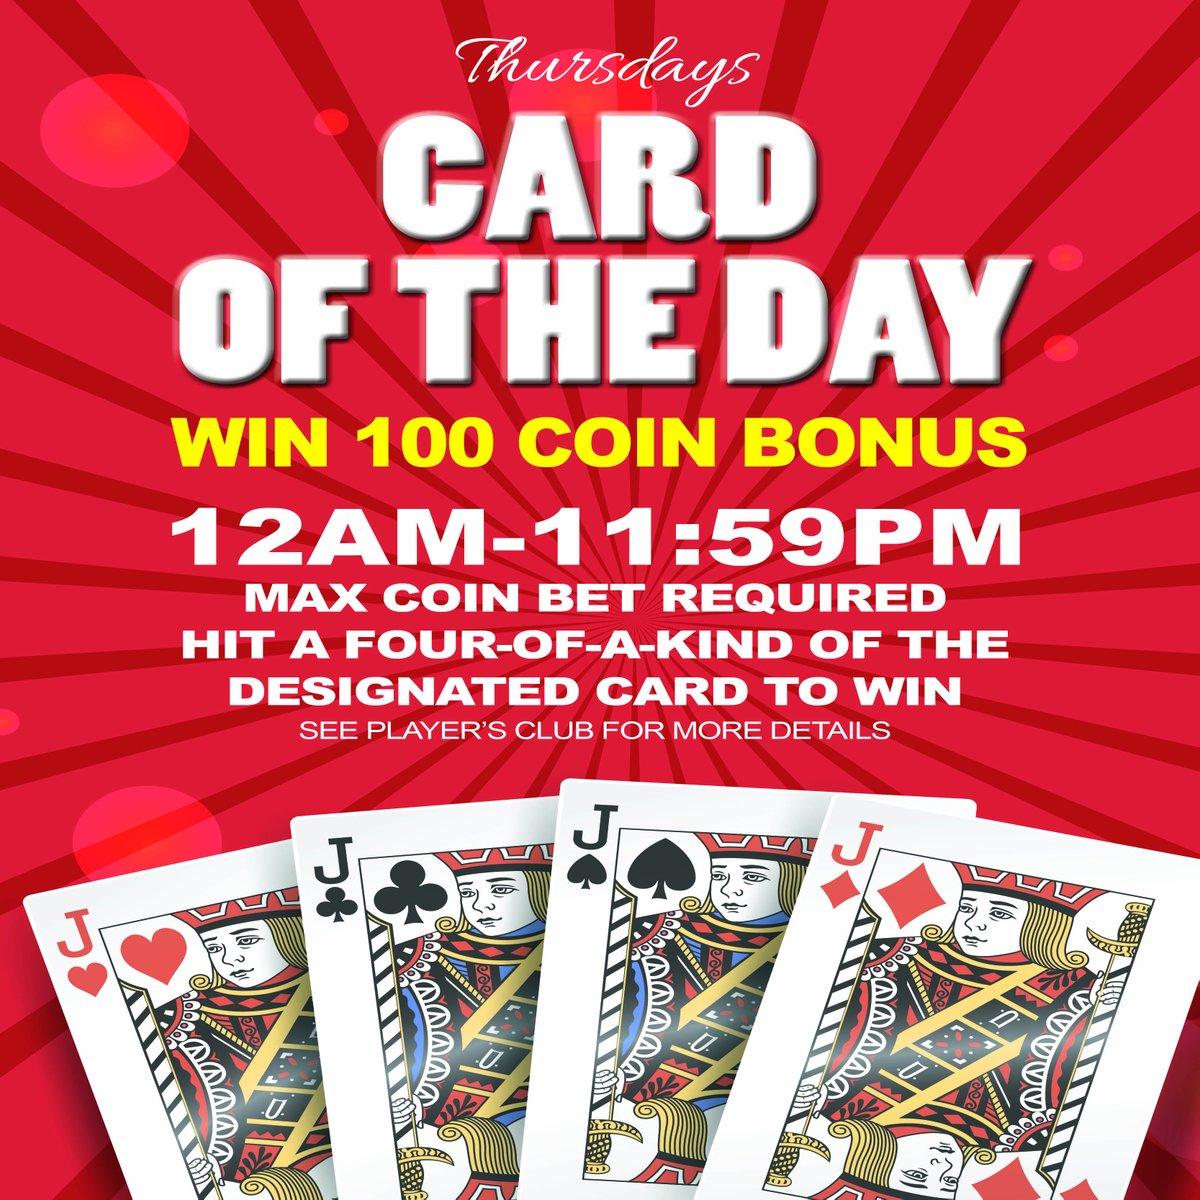 Hit the designated card of the day & win!   #RailroadPass #Railroadpasscasino #Casino #Gaming #bouldercity #bouldercitynv #nevada #travelnevada #vegas #henderson #hendersonnv #LasVegas #gambling #CasinoNight #CasinoRoyale #CasinoLifepic.twitter.com/AGn5wbYBUu